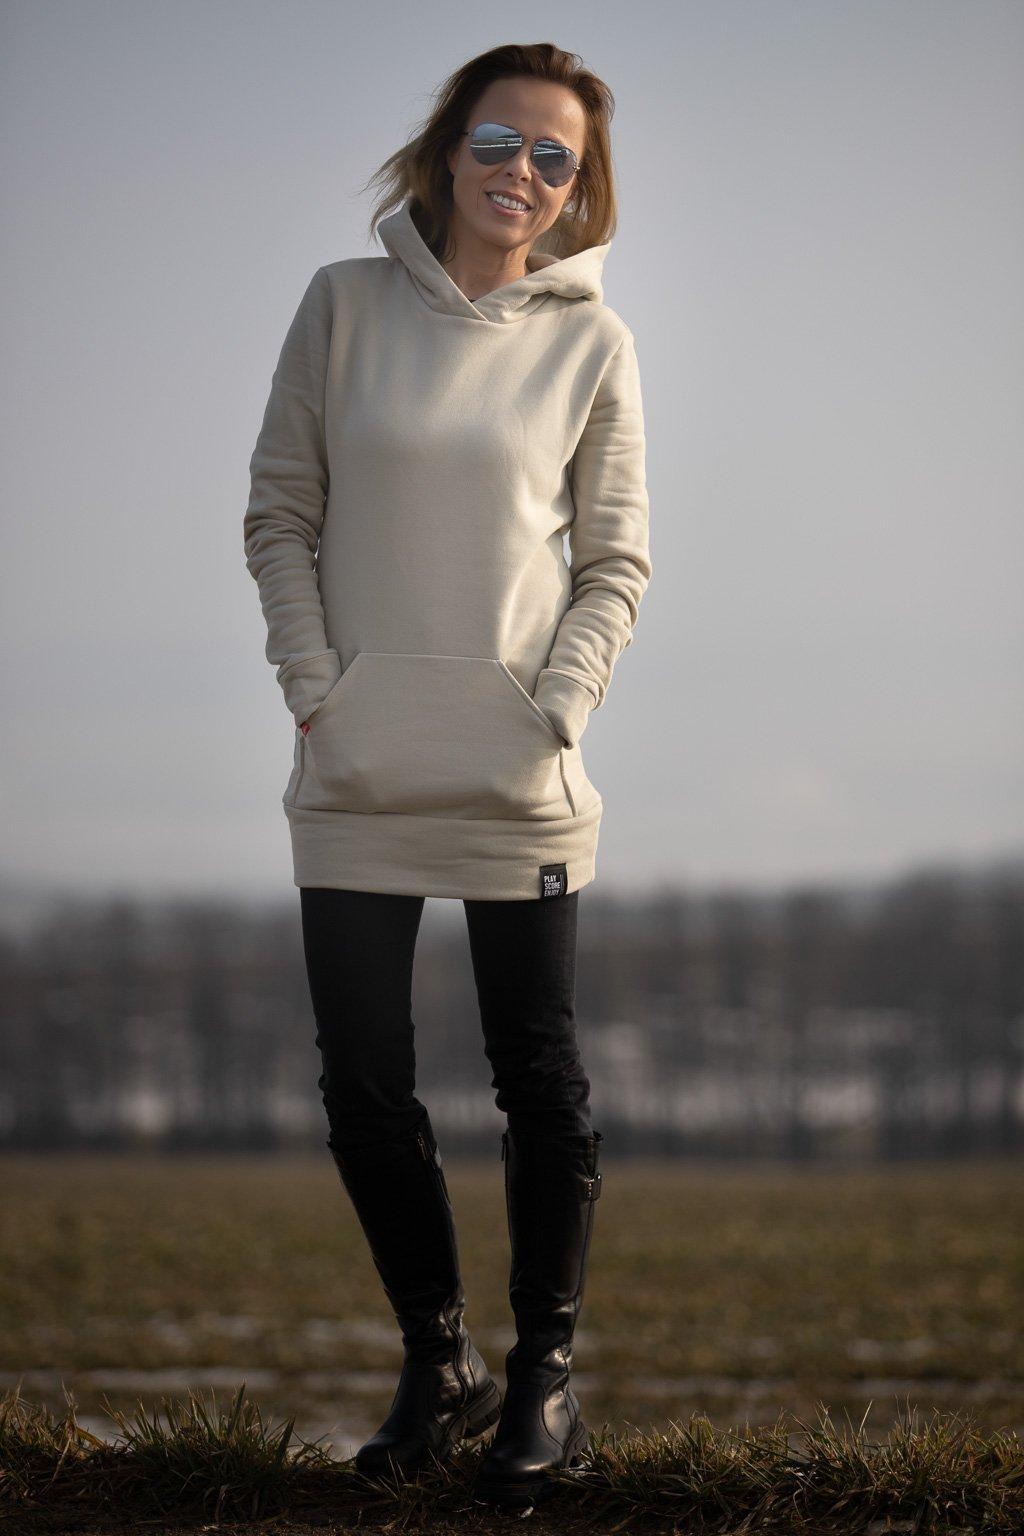 damska bavlnena mikna s kapuci hoodie cream 1 6